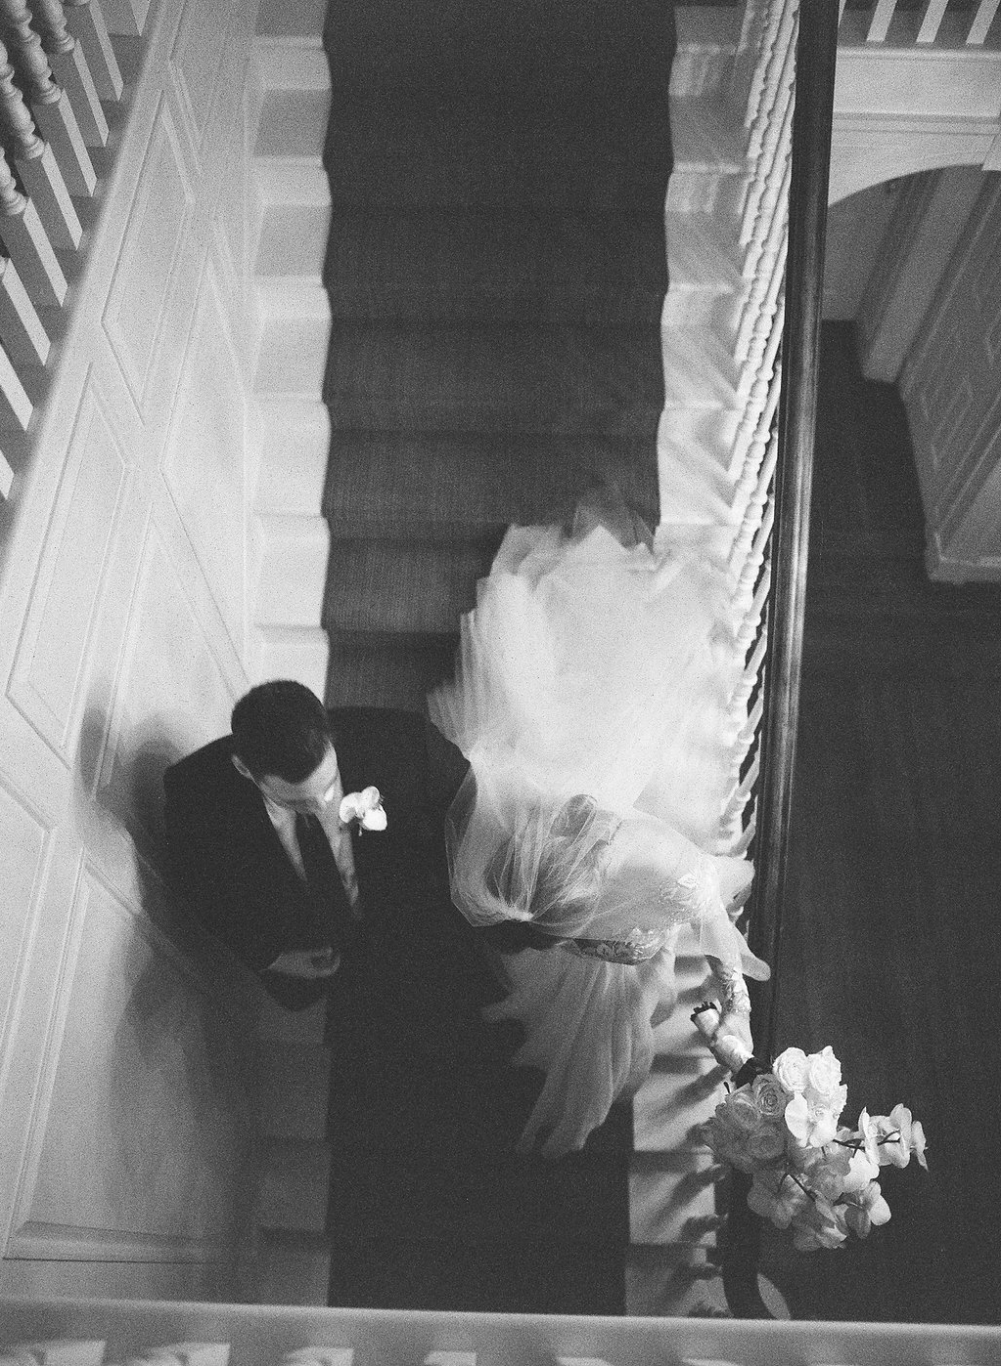 Koryn-Jason-Jewish-Wedding-California-Beaux-Arts-Photographie-Nov-2016-02.png